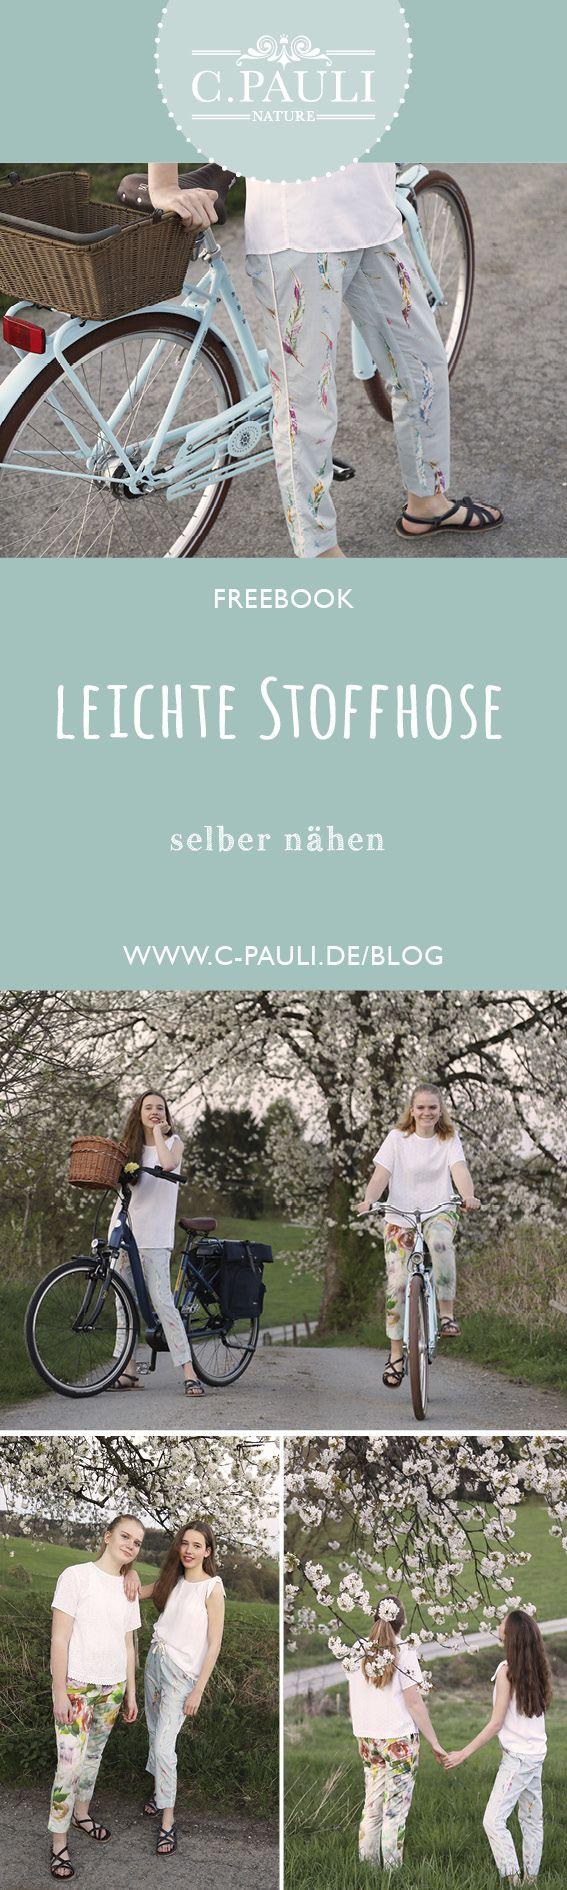 Leichte Stoffhose | C.Pauli Nature Blog – Sylvia T.